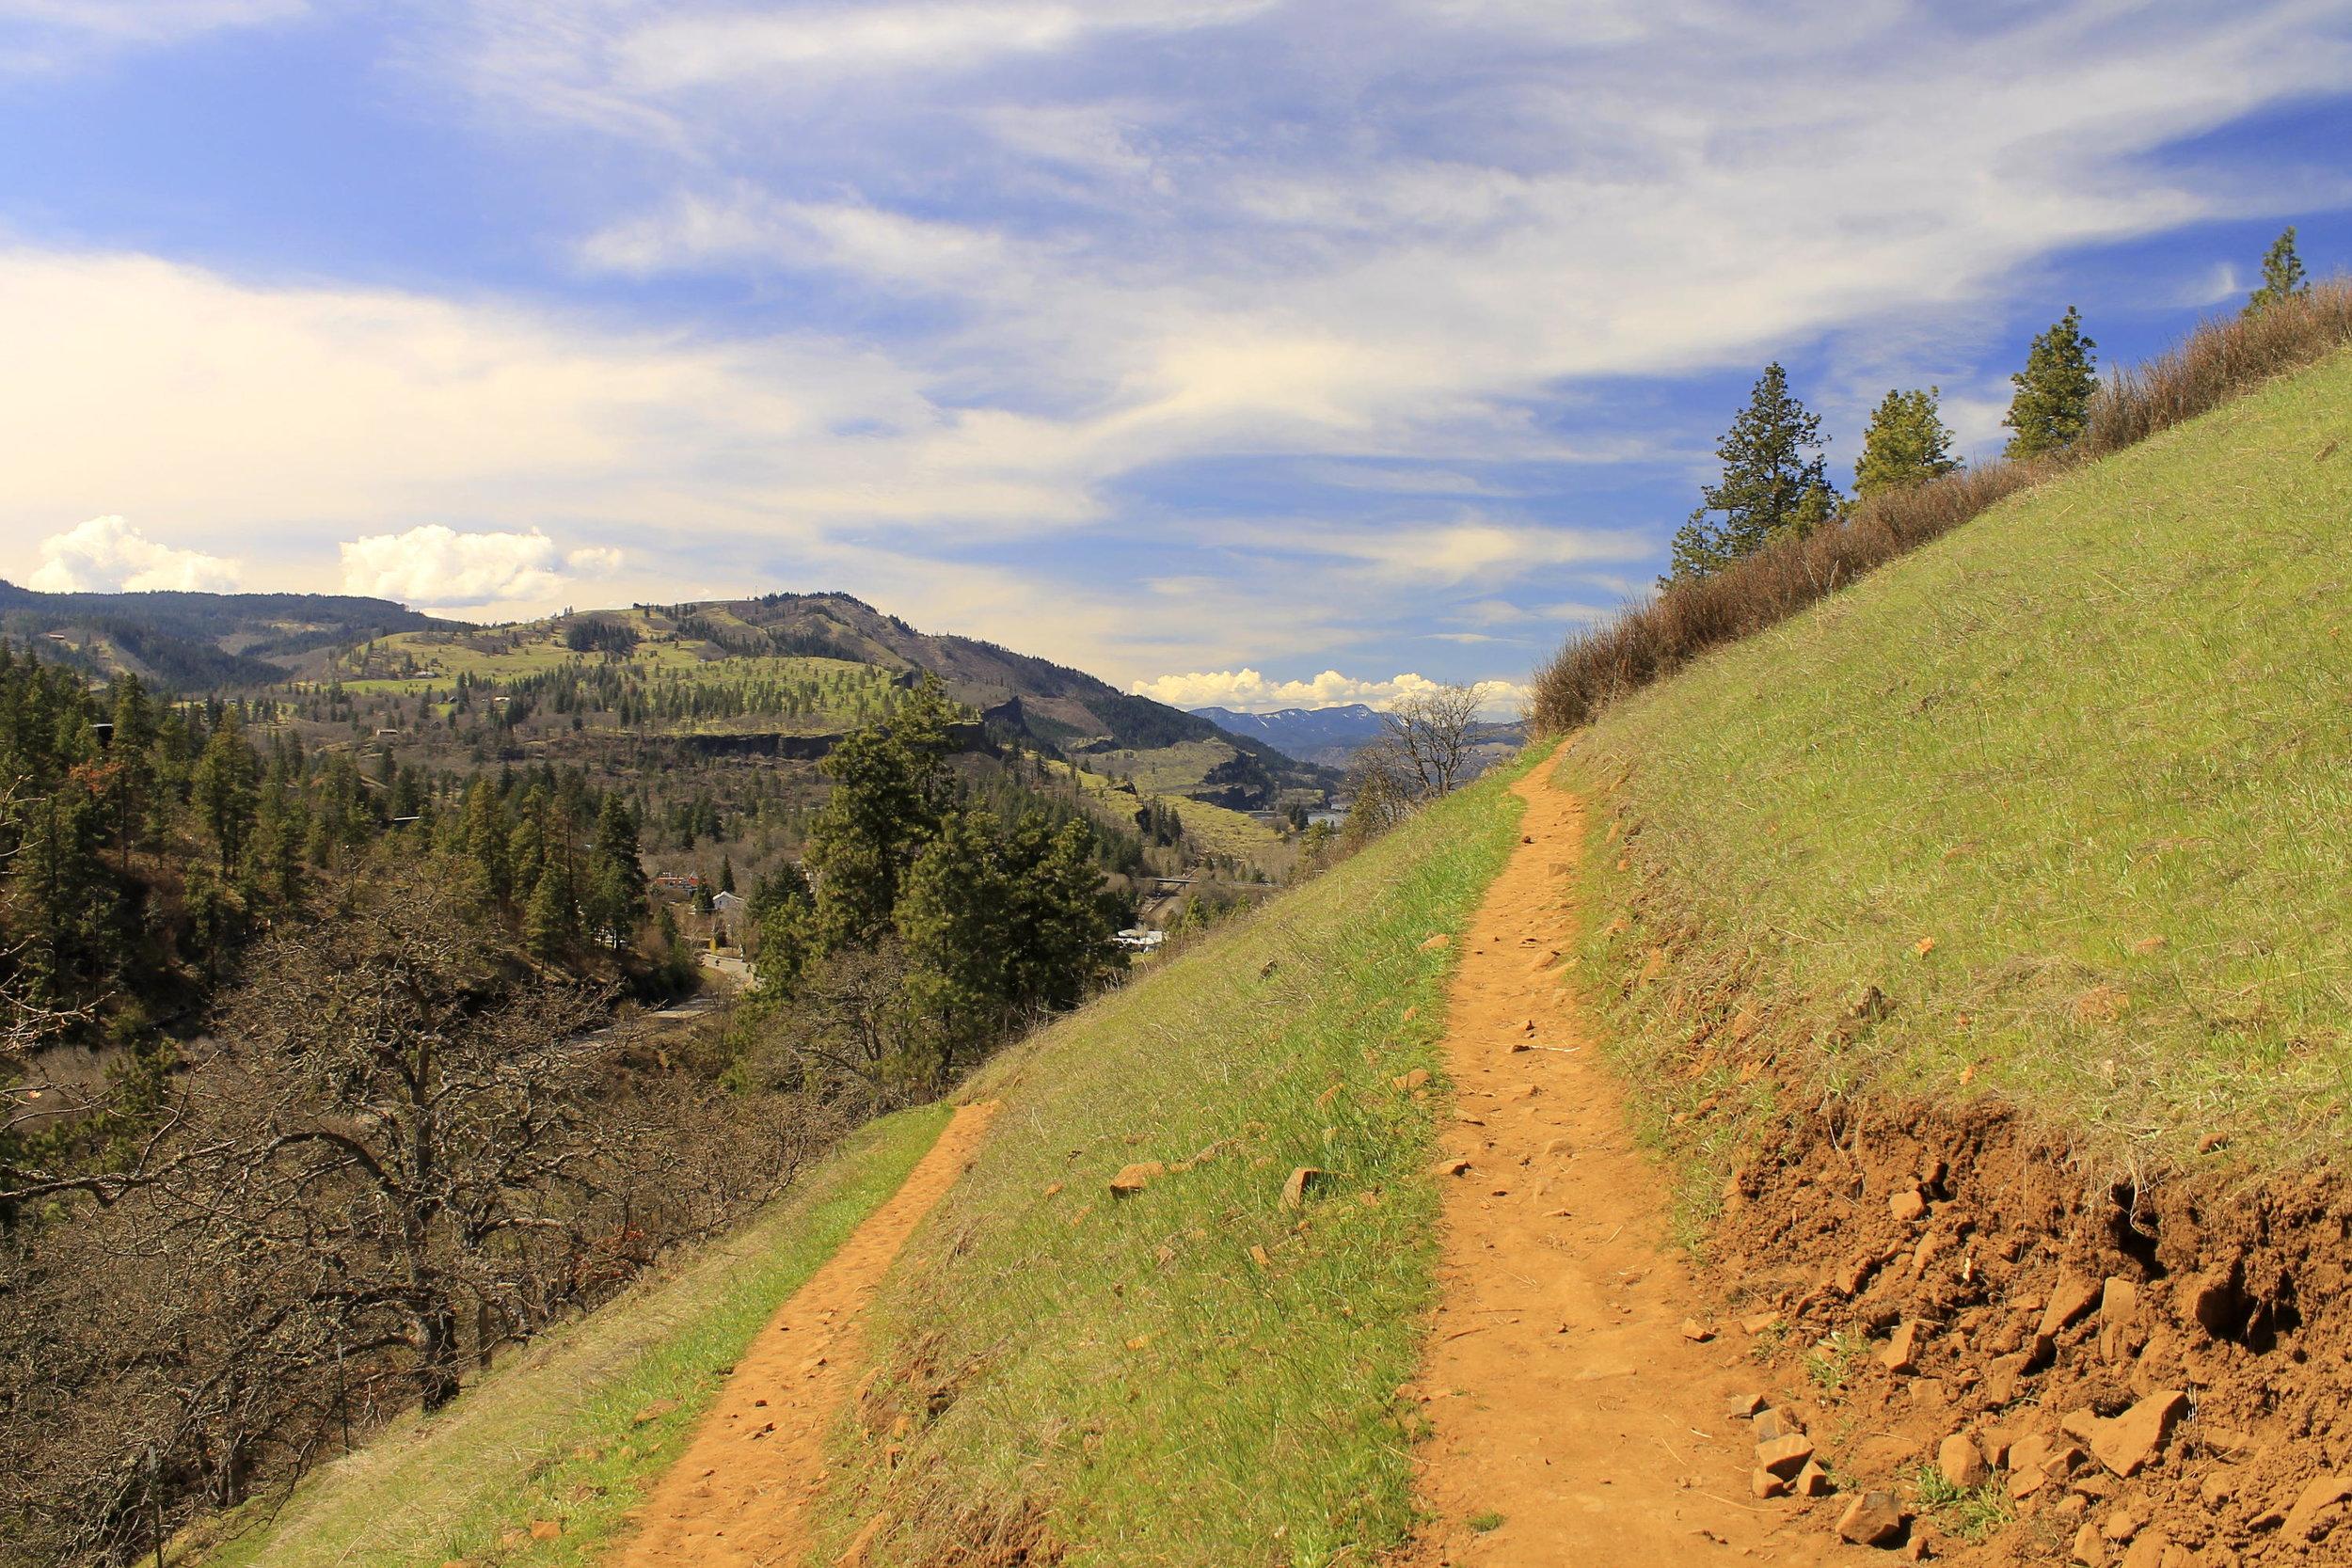 Mosier Plateau on March 31